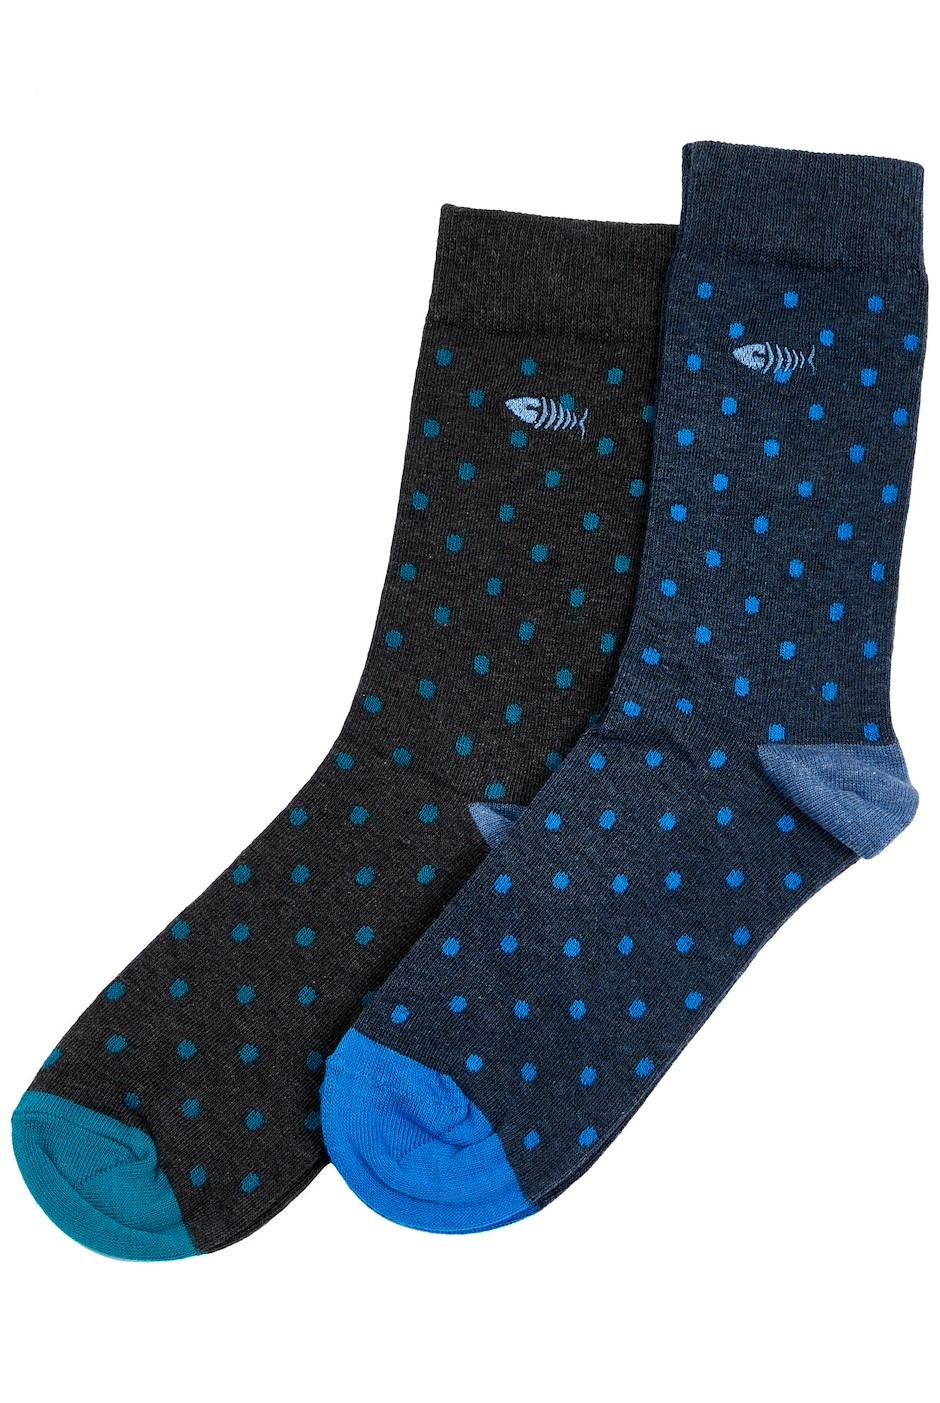 Tralee Polka Dot Socks Twin Pack Dark Navy